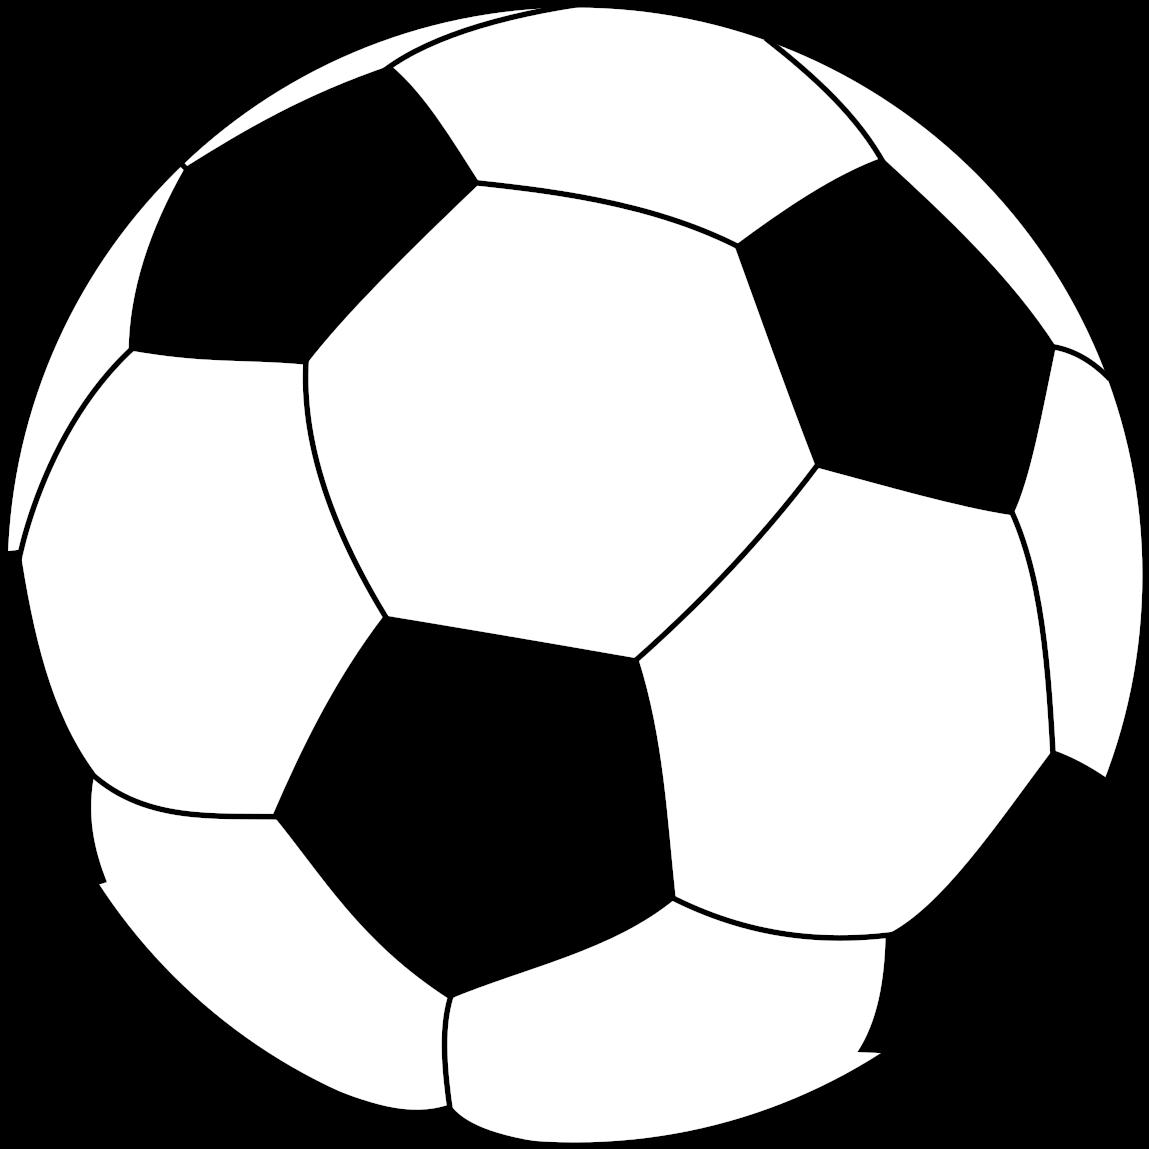 Open Soccer Ball Clipart Full Size Clipart 47394